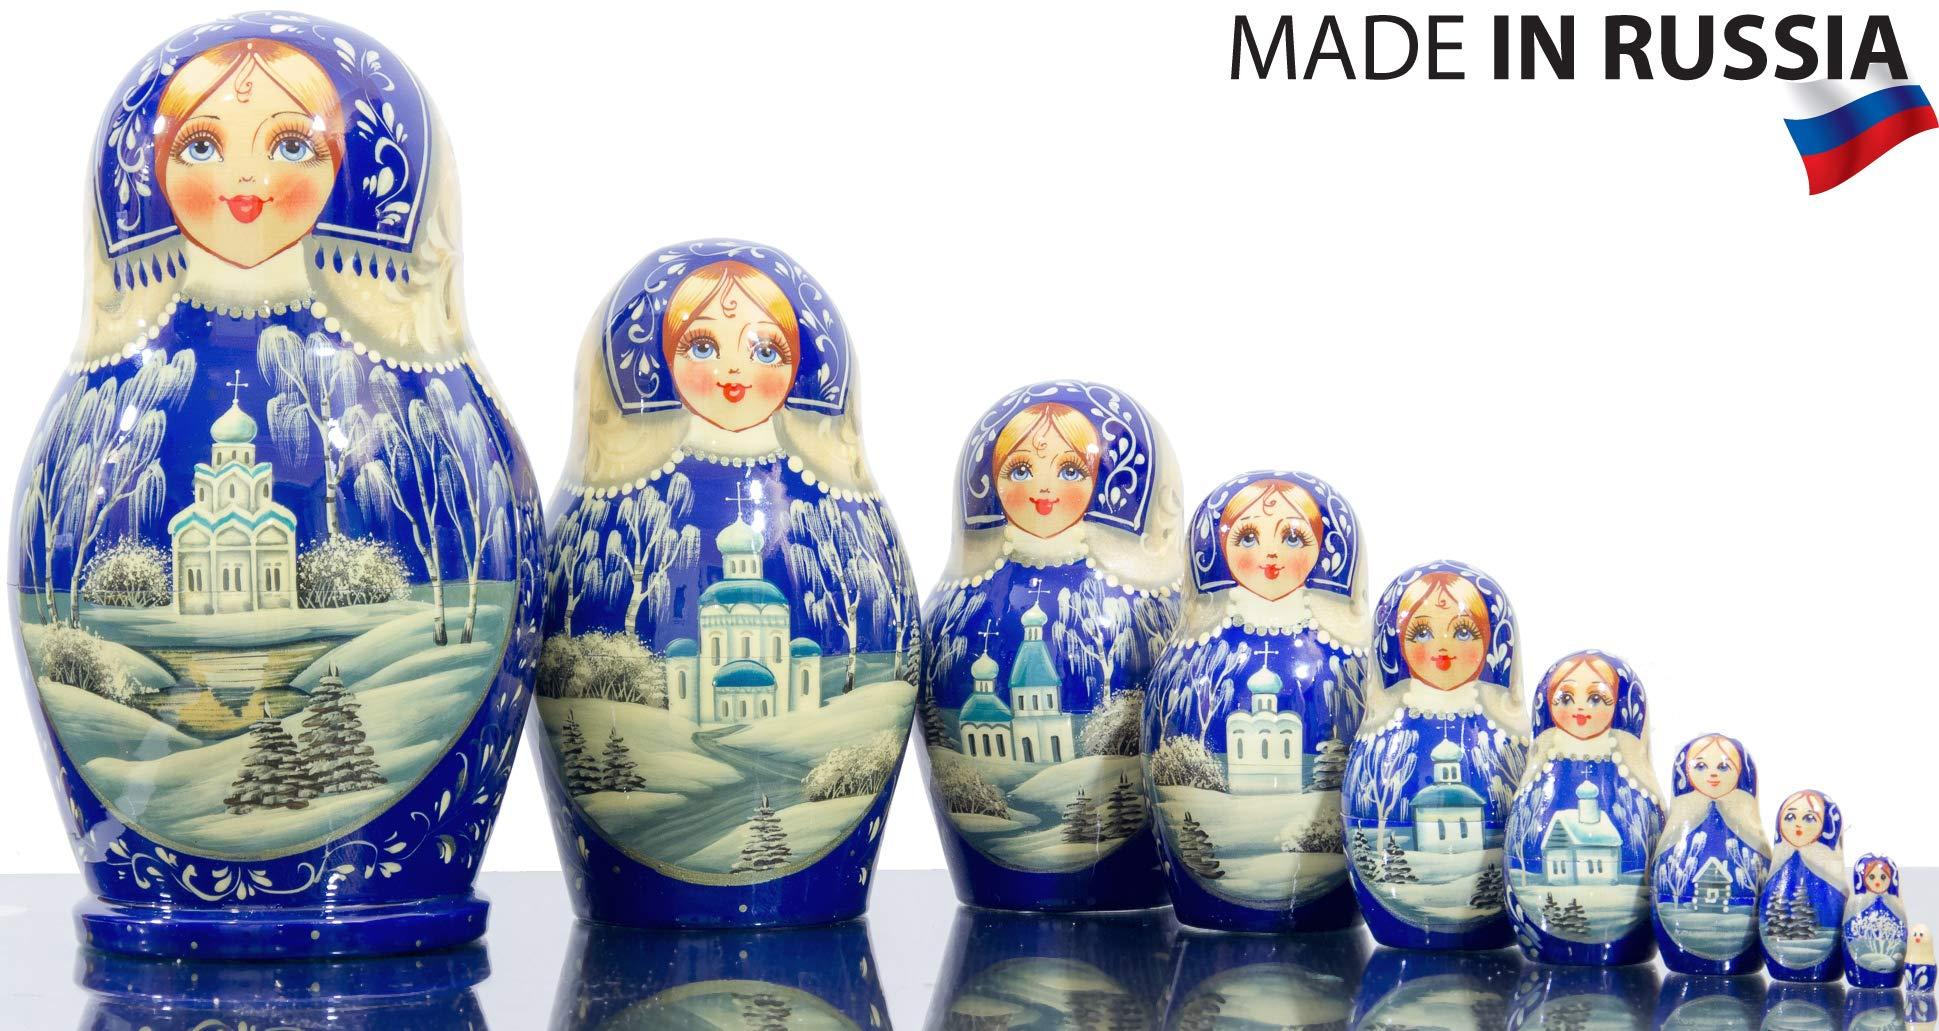 Russian Nesting Doll - Kirov - VJATKA - Hand Painted in Russia - Big Size - Wooden Decoration Gift Doll - Matryoshka Babushka (Style E, 8.25``(10 Dolls in 1))